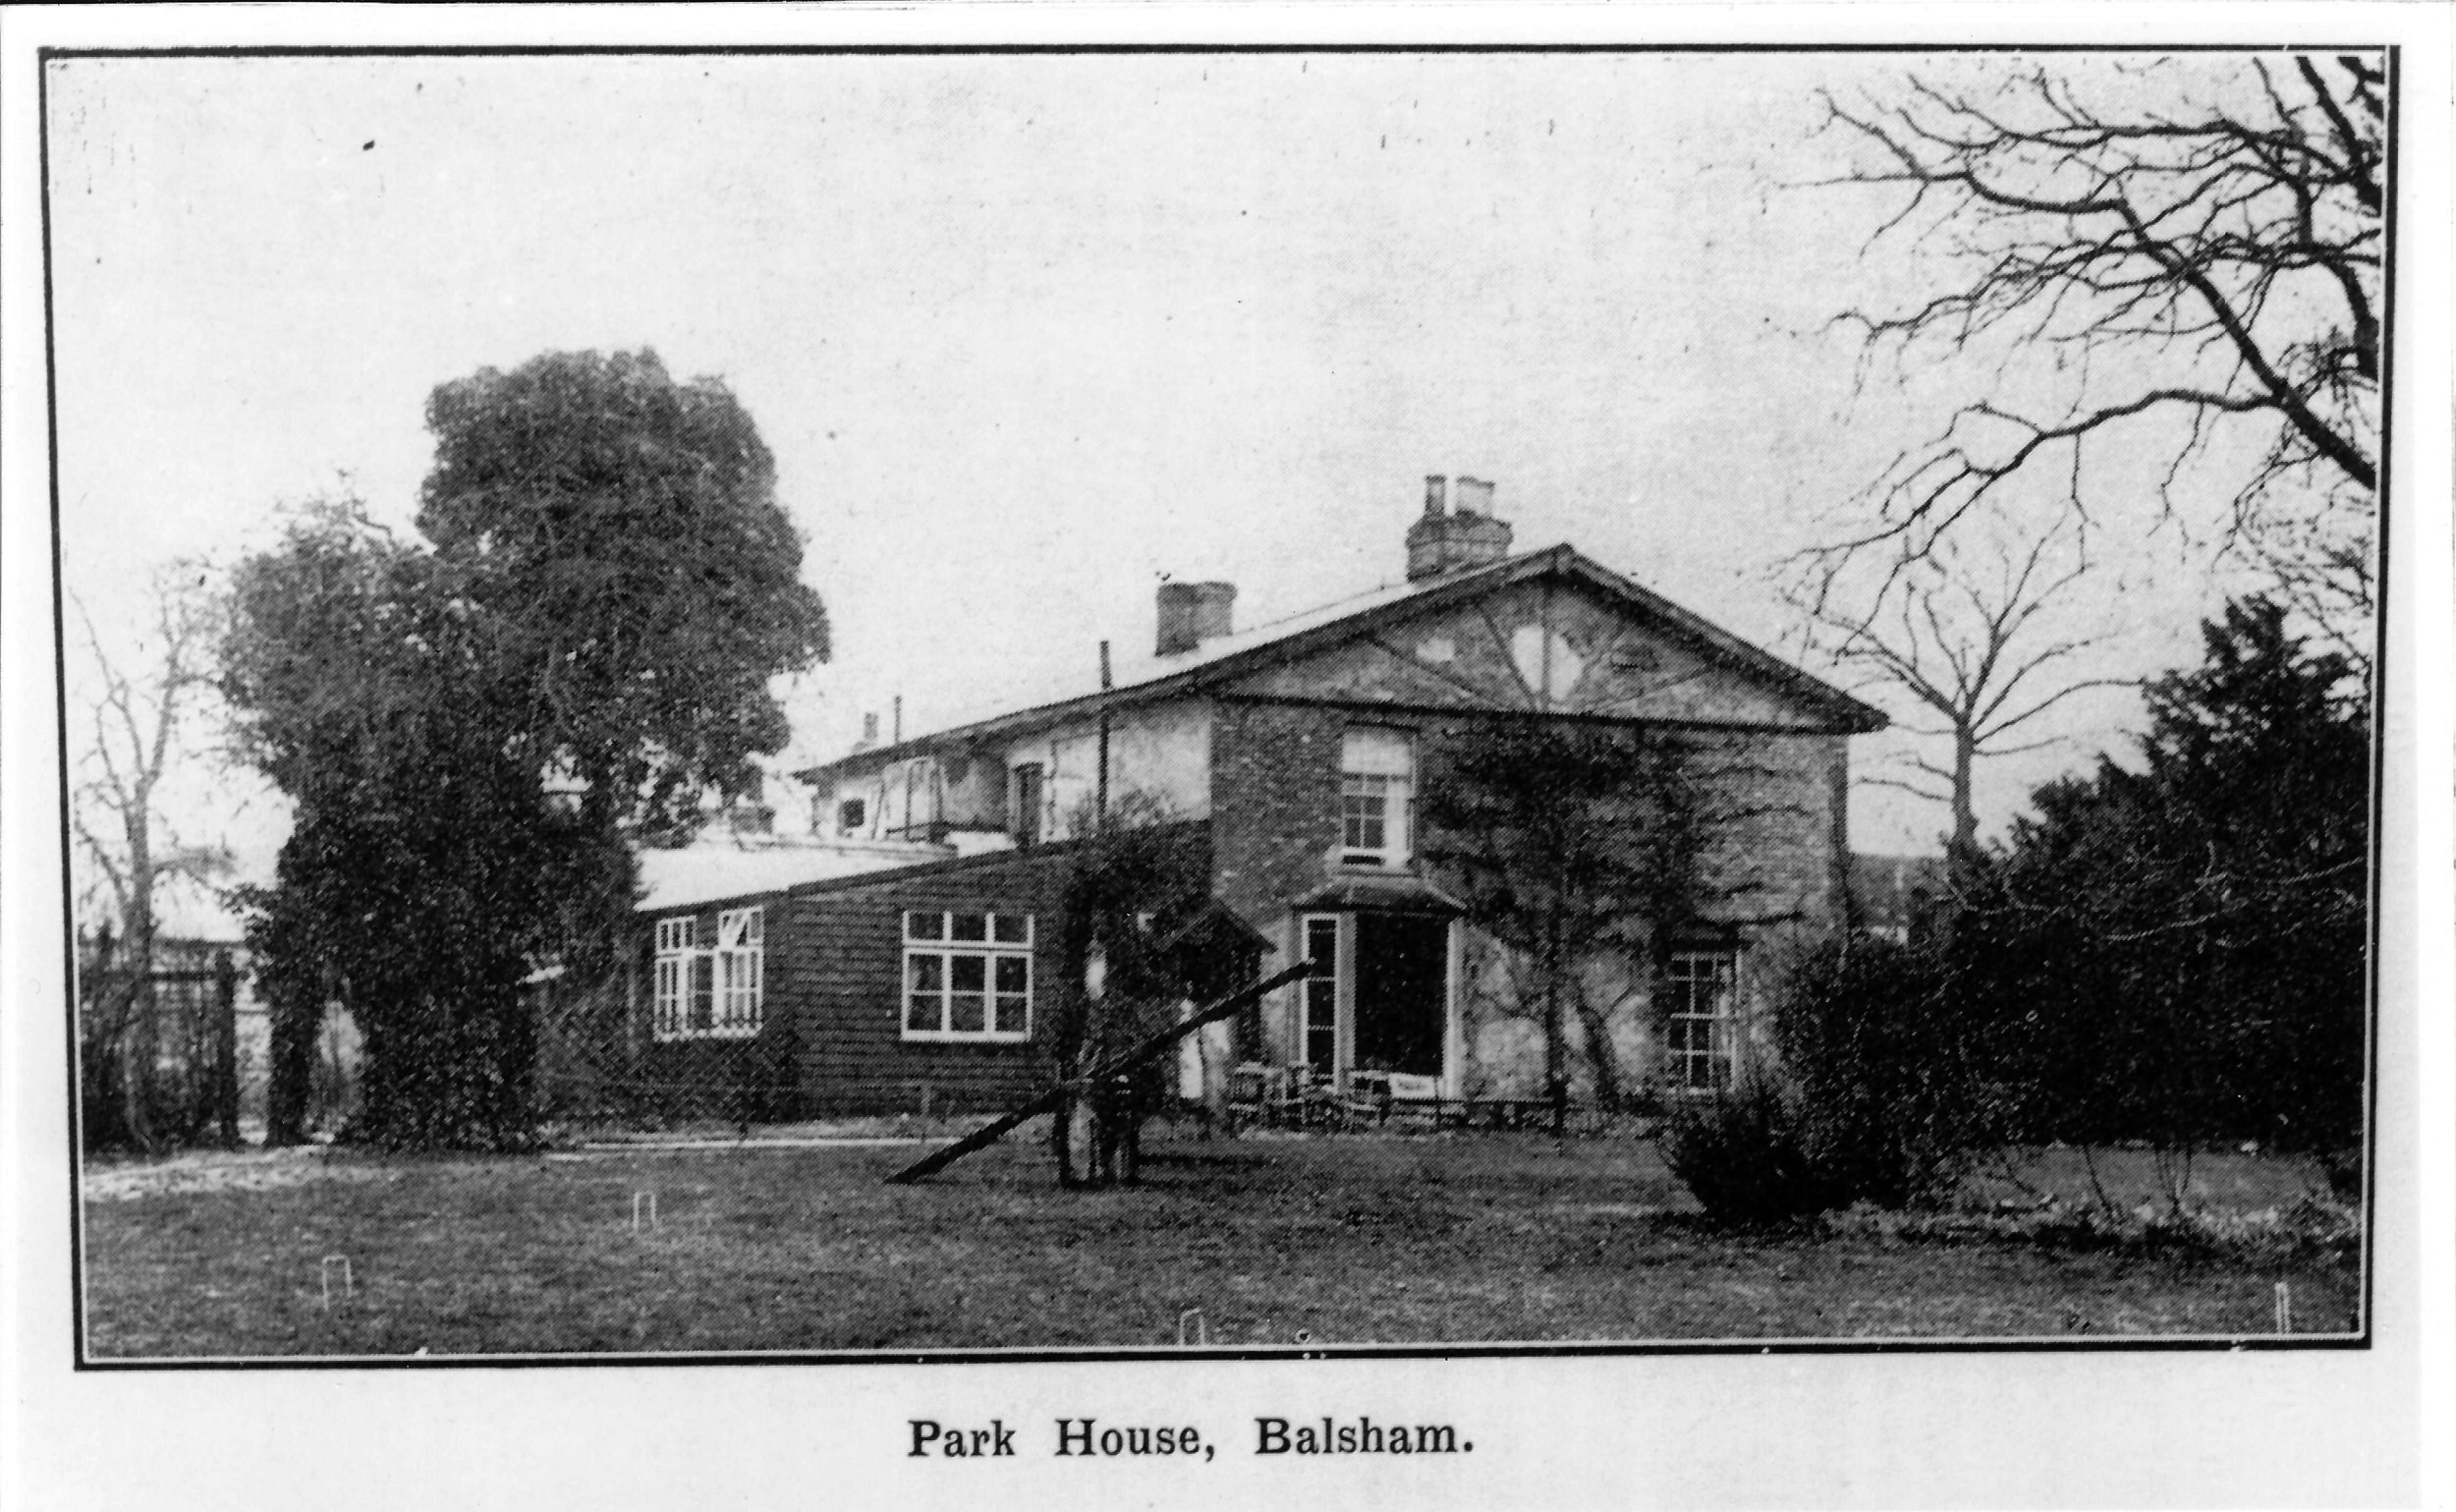 A postcard of Park House